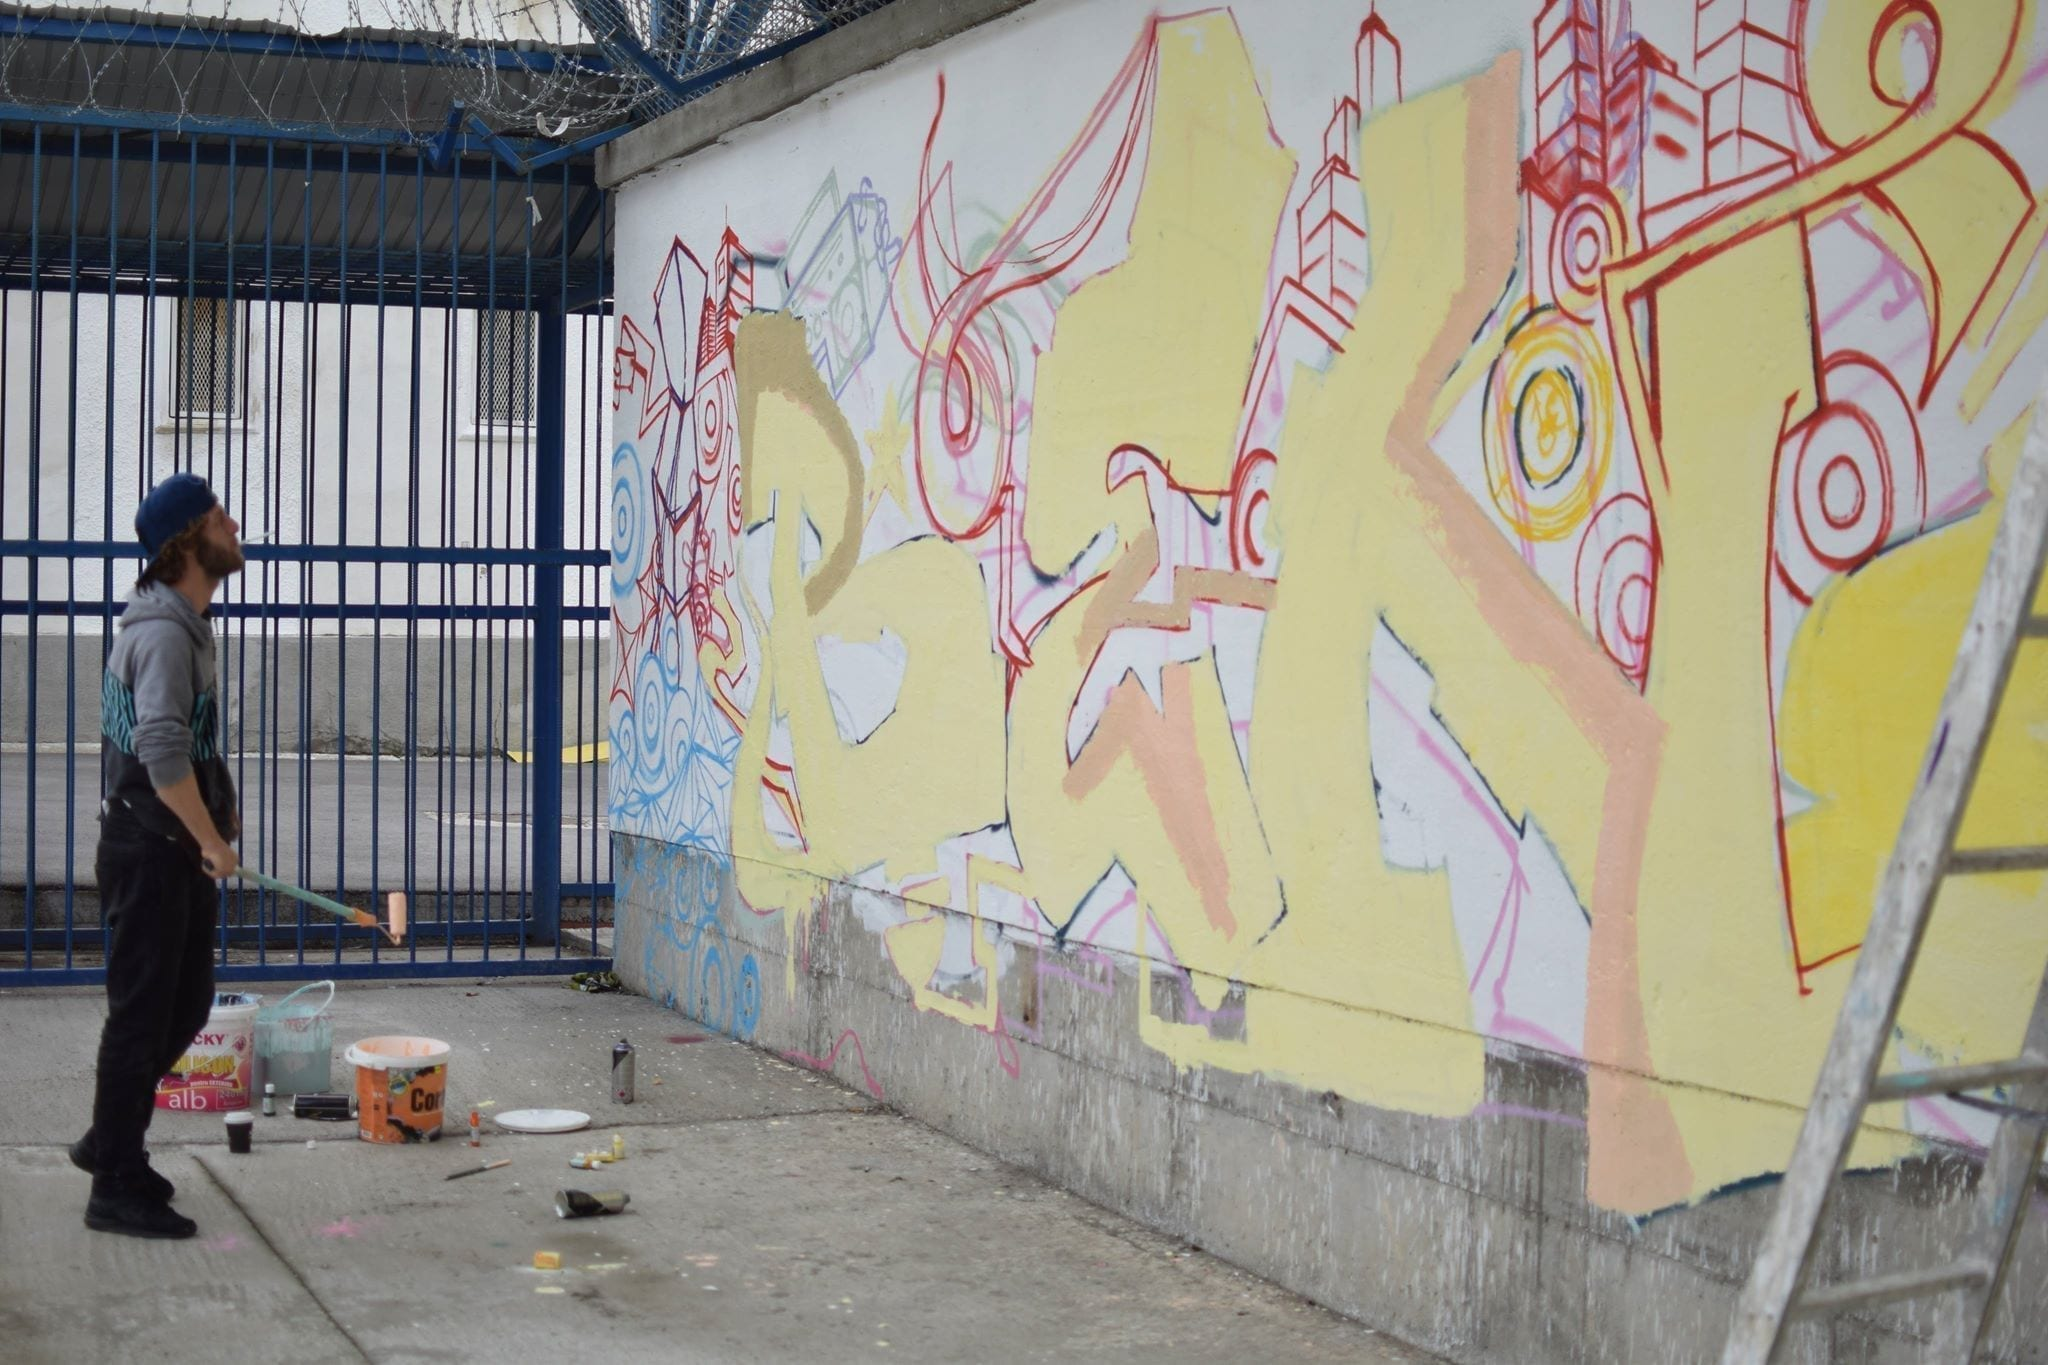 Beno Street Delivery penitenciarul Iași 2018 Un-hidden street art in Romania book art files